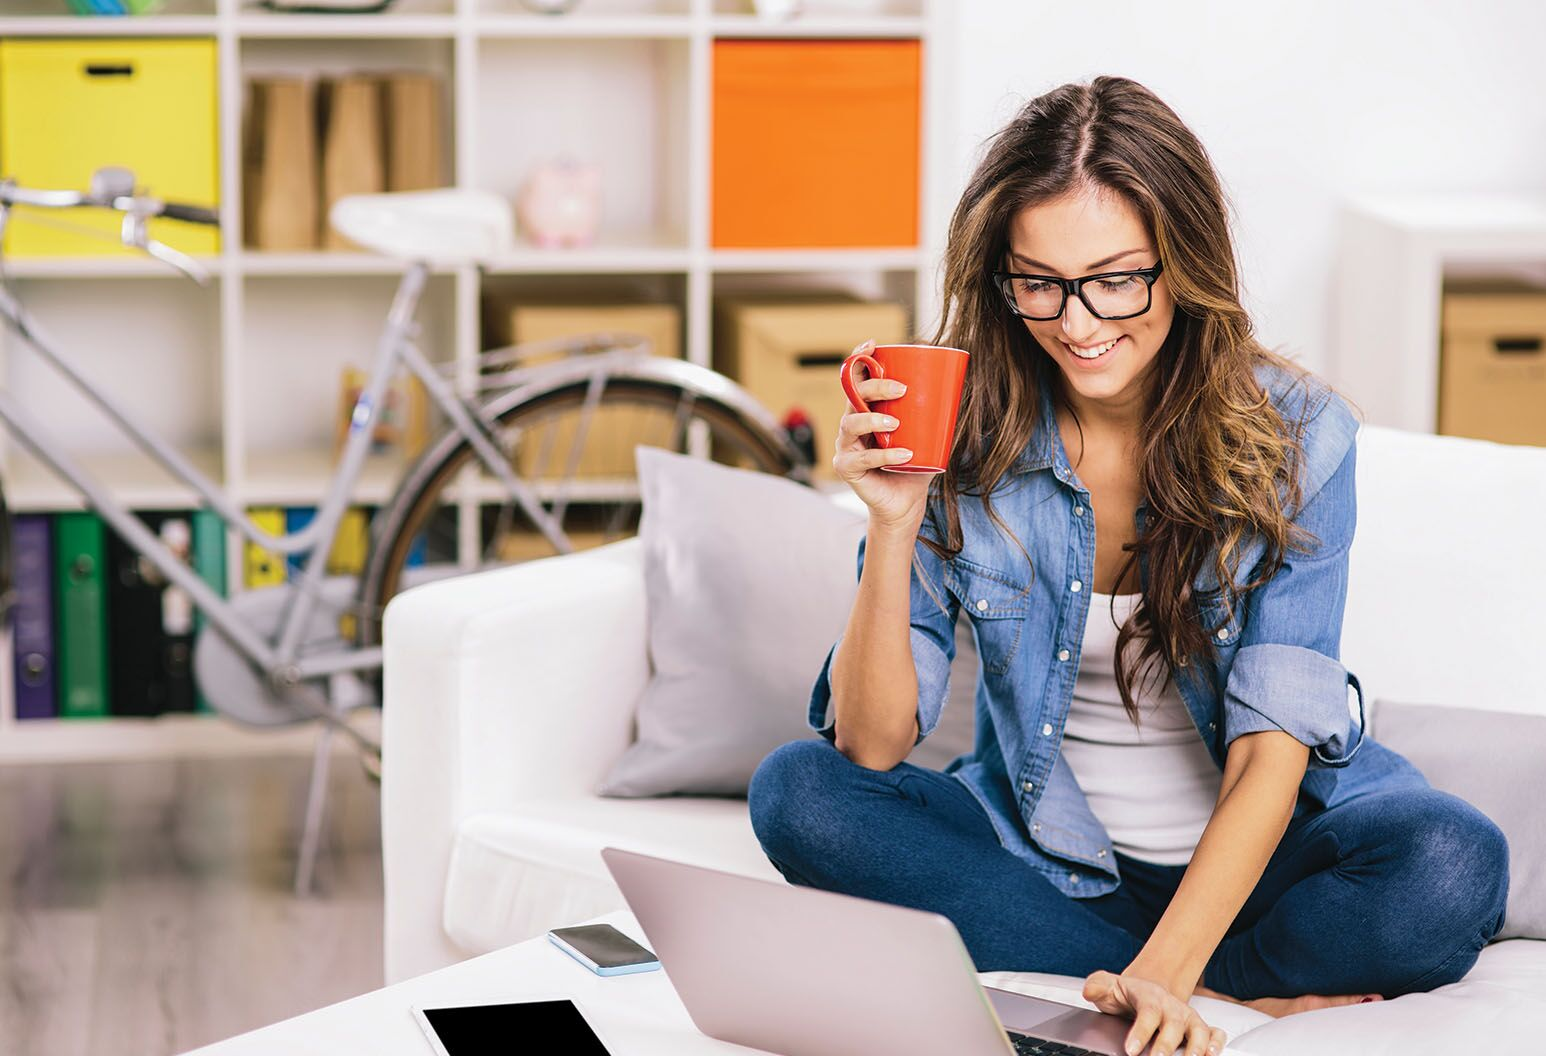 a women holding a coffee mug using a laptop